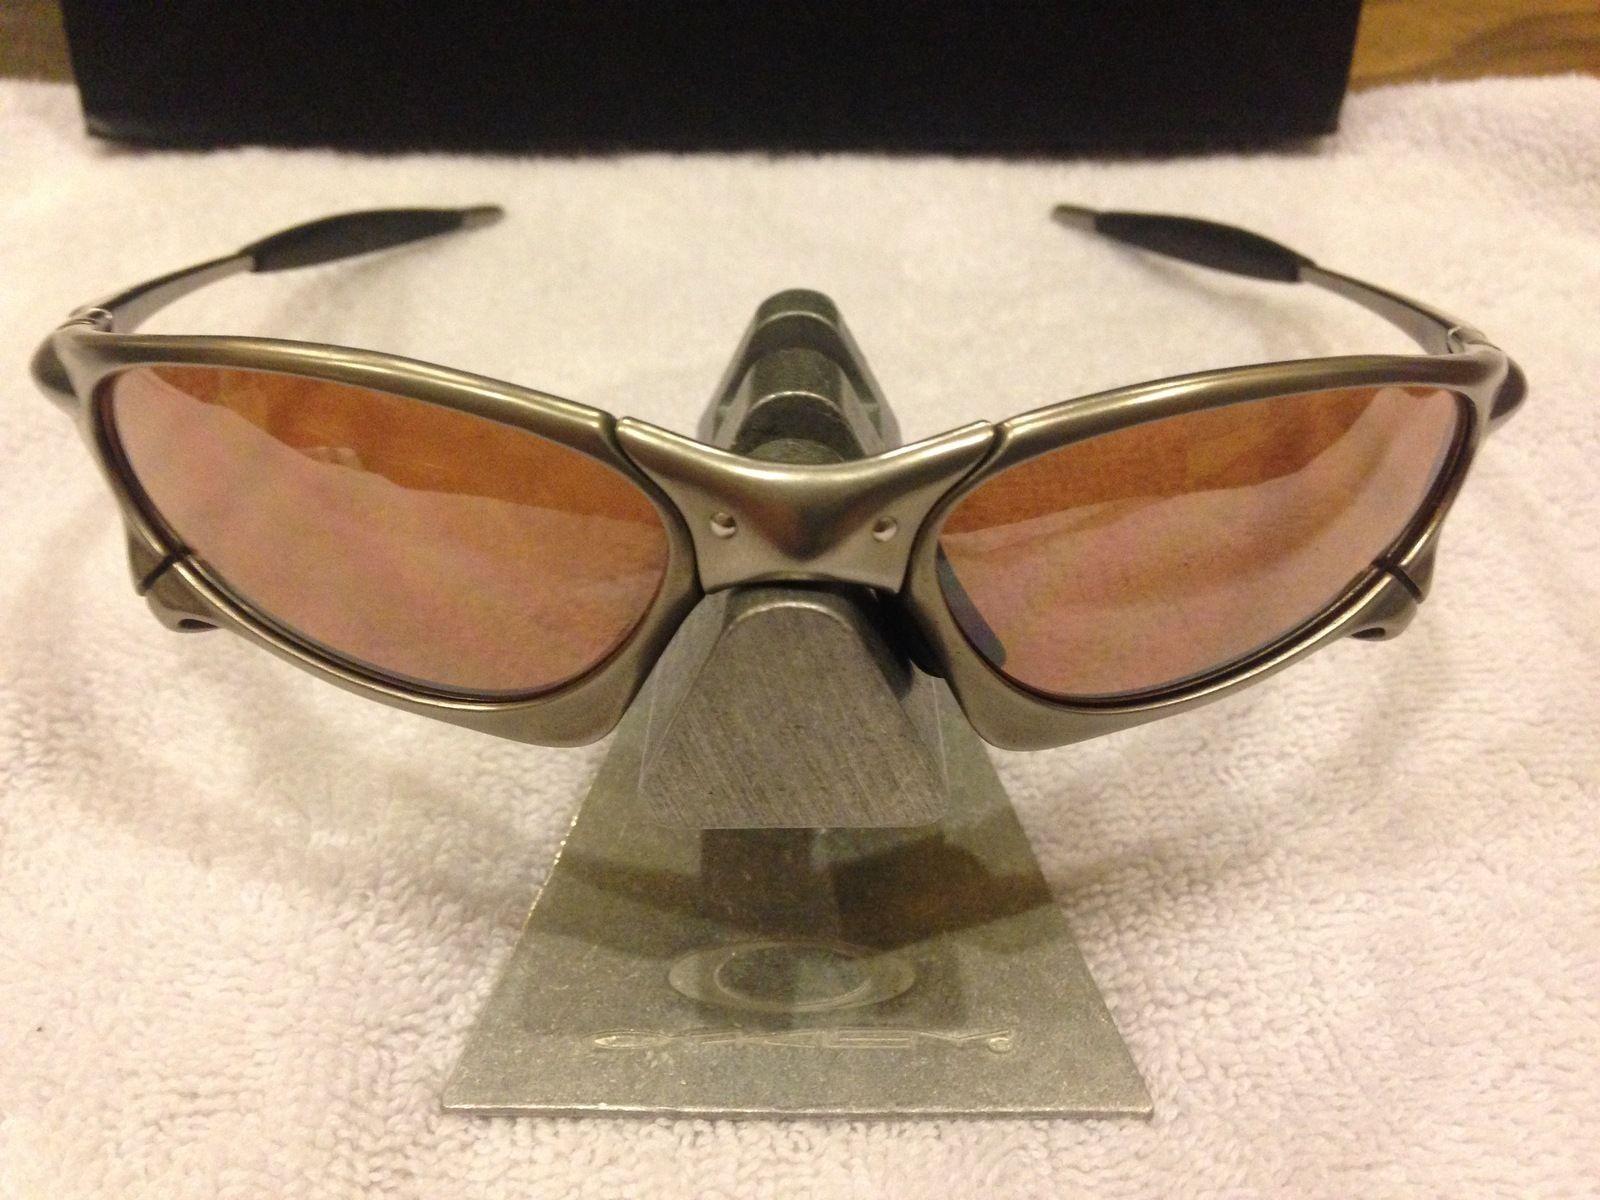 Penny Titanium w/ VR28 and Ice Iridium + bonus $350 - rwHyP0F.jpg